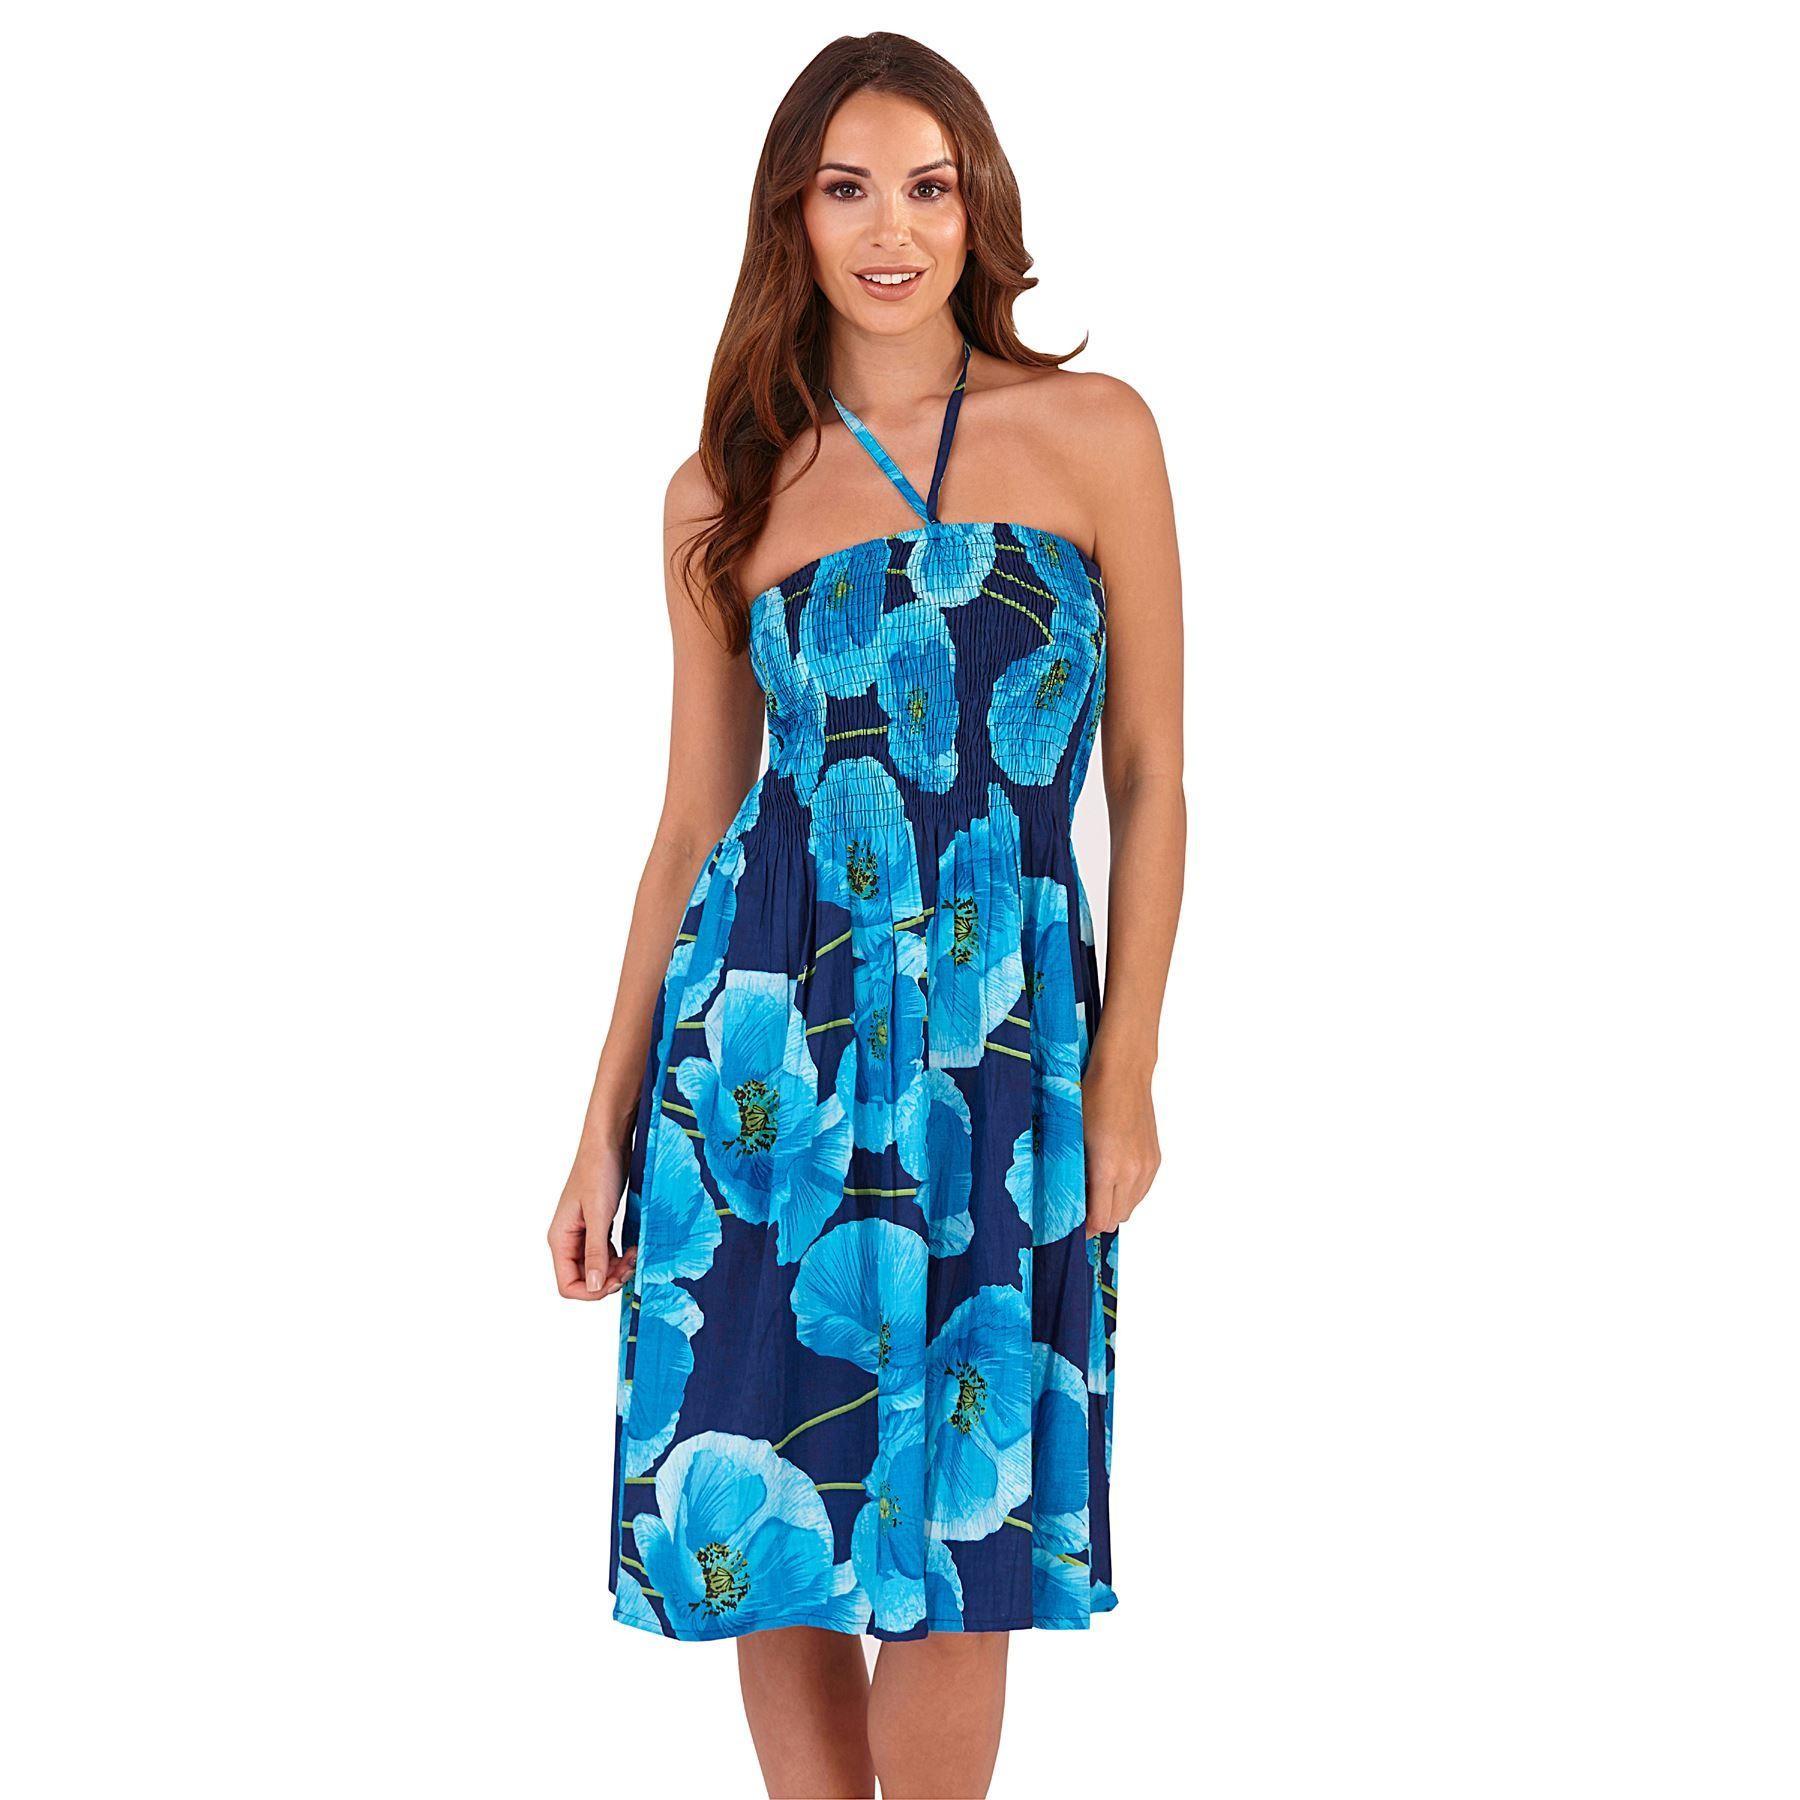 Pistachio Poppy Print 3 in 1 Dress - Blue